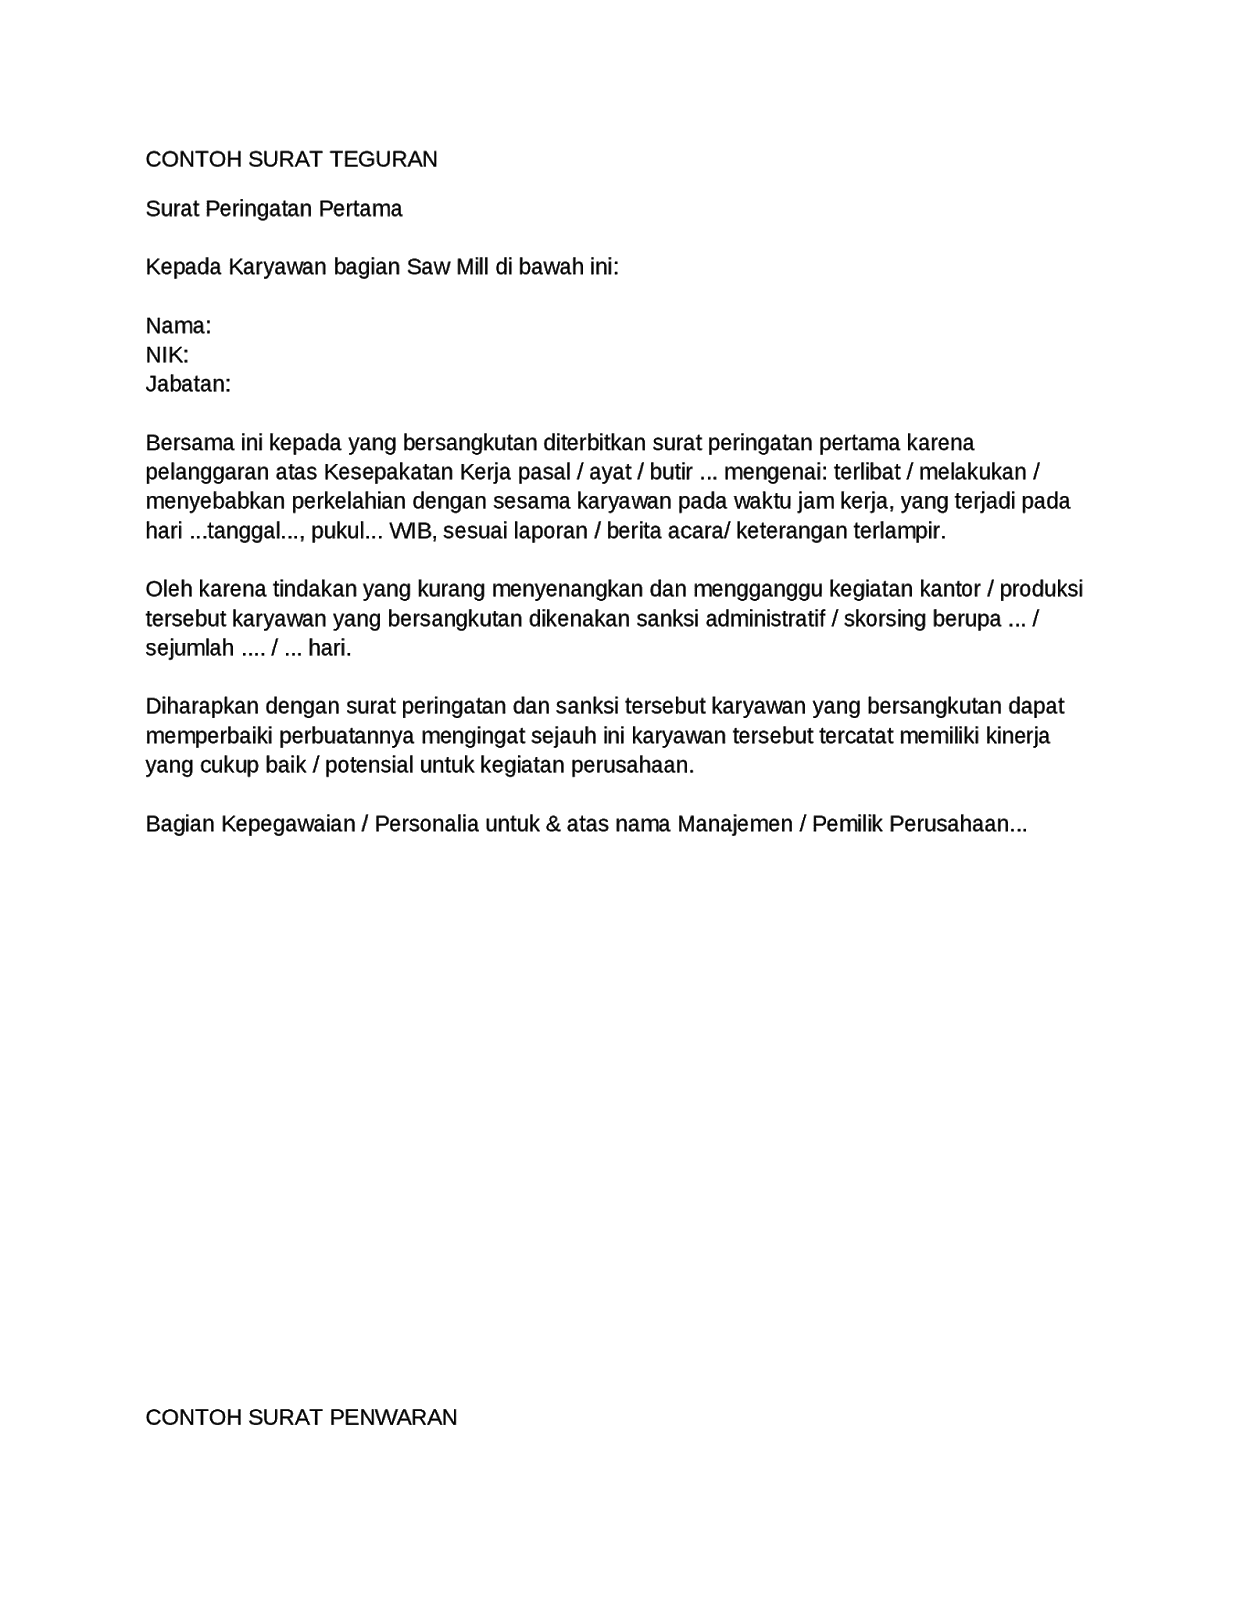 Contoh Surat Teguran Perangkat Desa